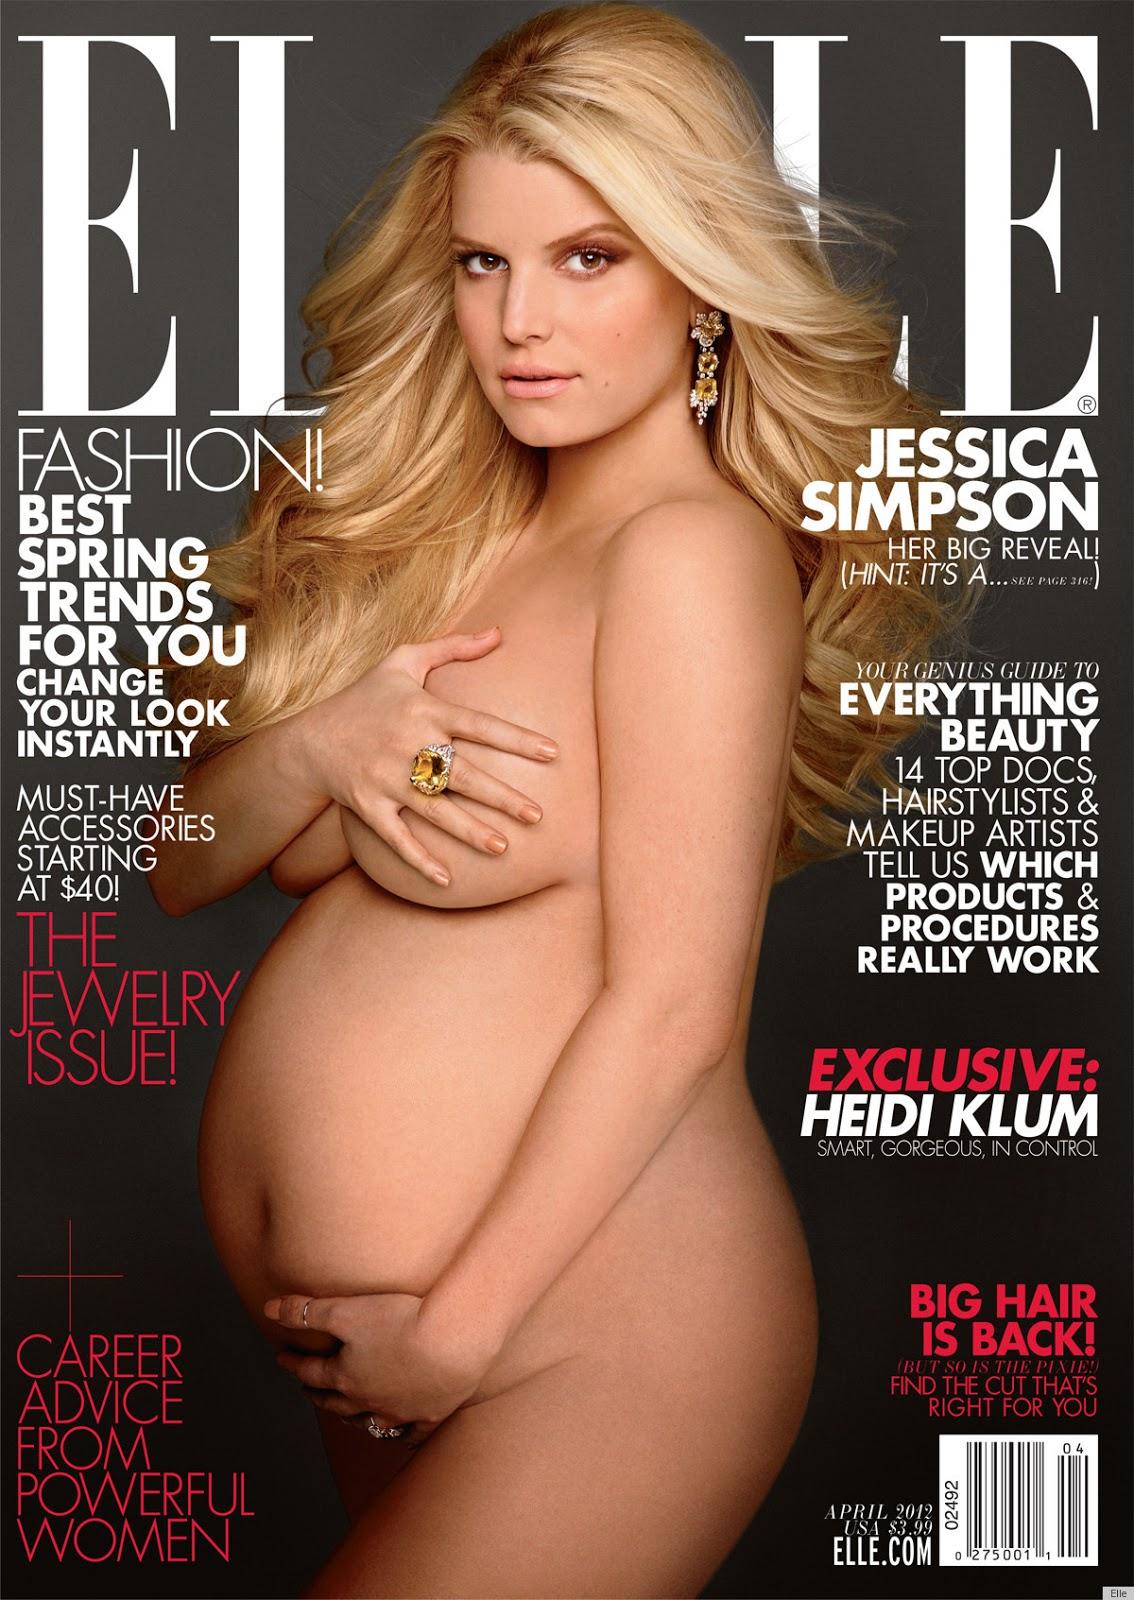 http://2.bp.blogspot.com/-1vlKY7zEDII/UNK6utoc1HI/AAAAAAAAT2k/wxVj98g_YPg/s1600/JESSICA-SIMPSON-NAKED-PREGNANT.jpg